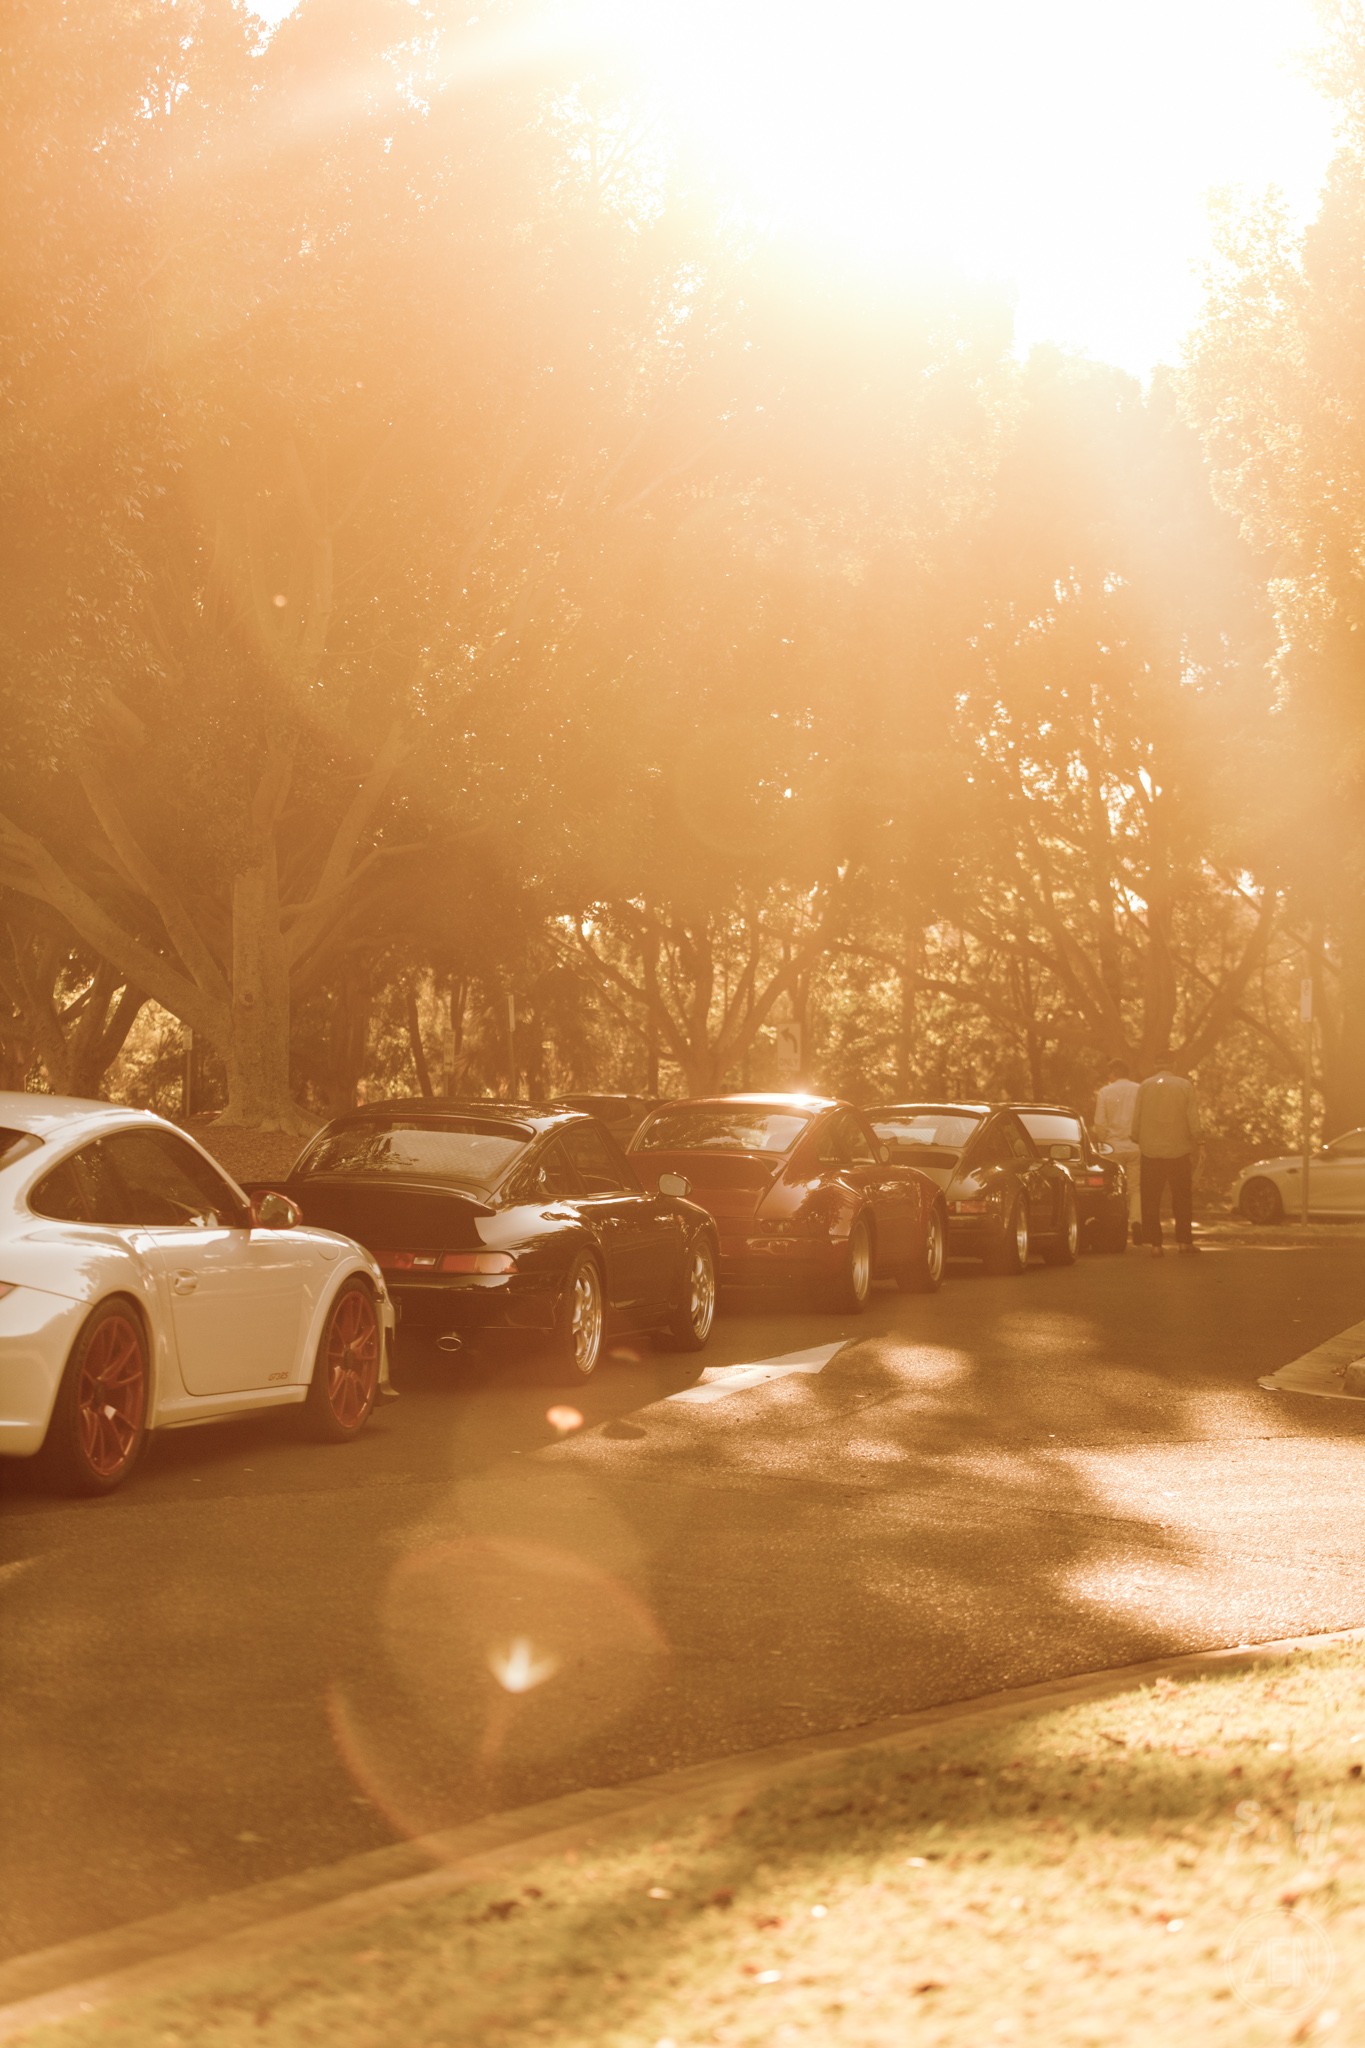 2019-10-27 - Autohaus Porsches & Coffee 068